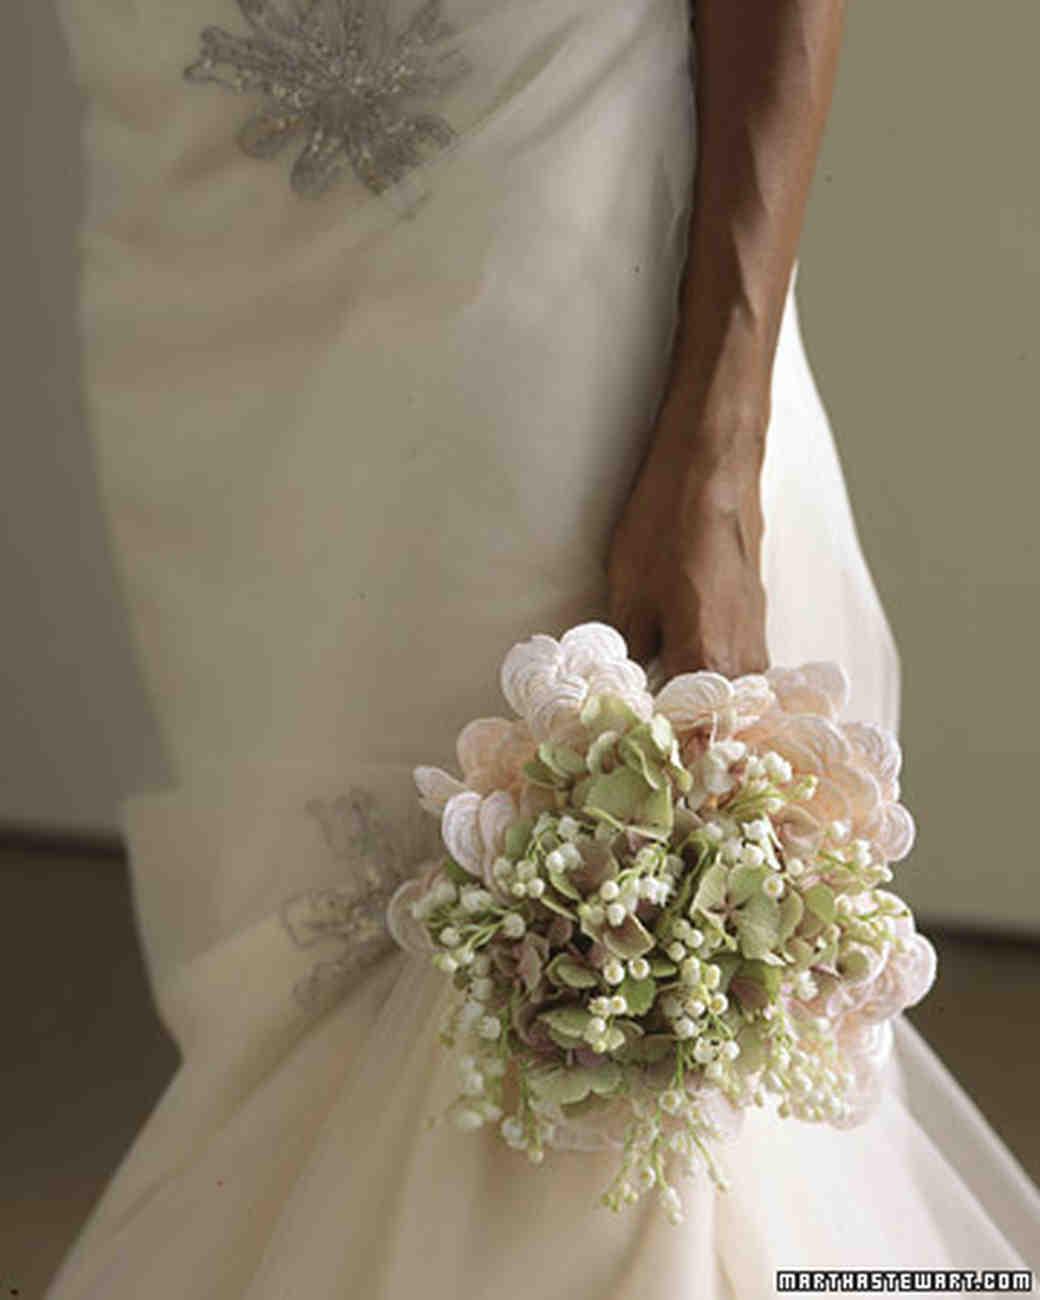 Martha Stewart Weddings: Hydrangea Wedding Flower Arrangements